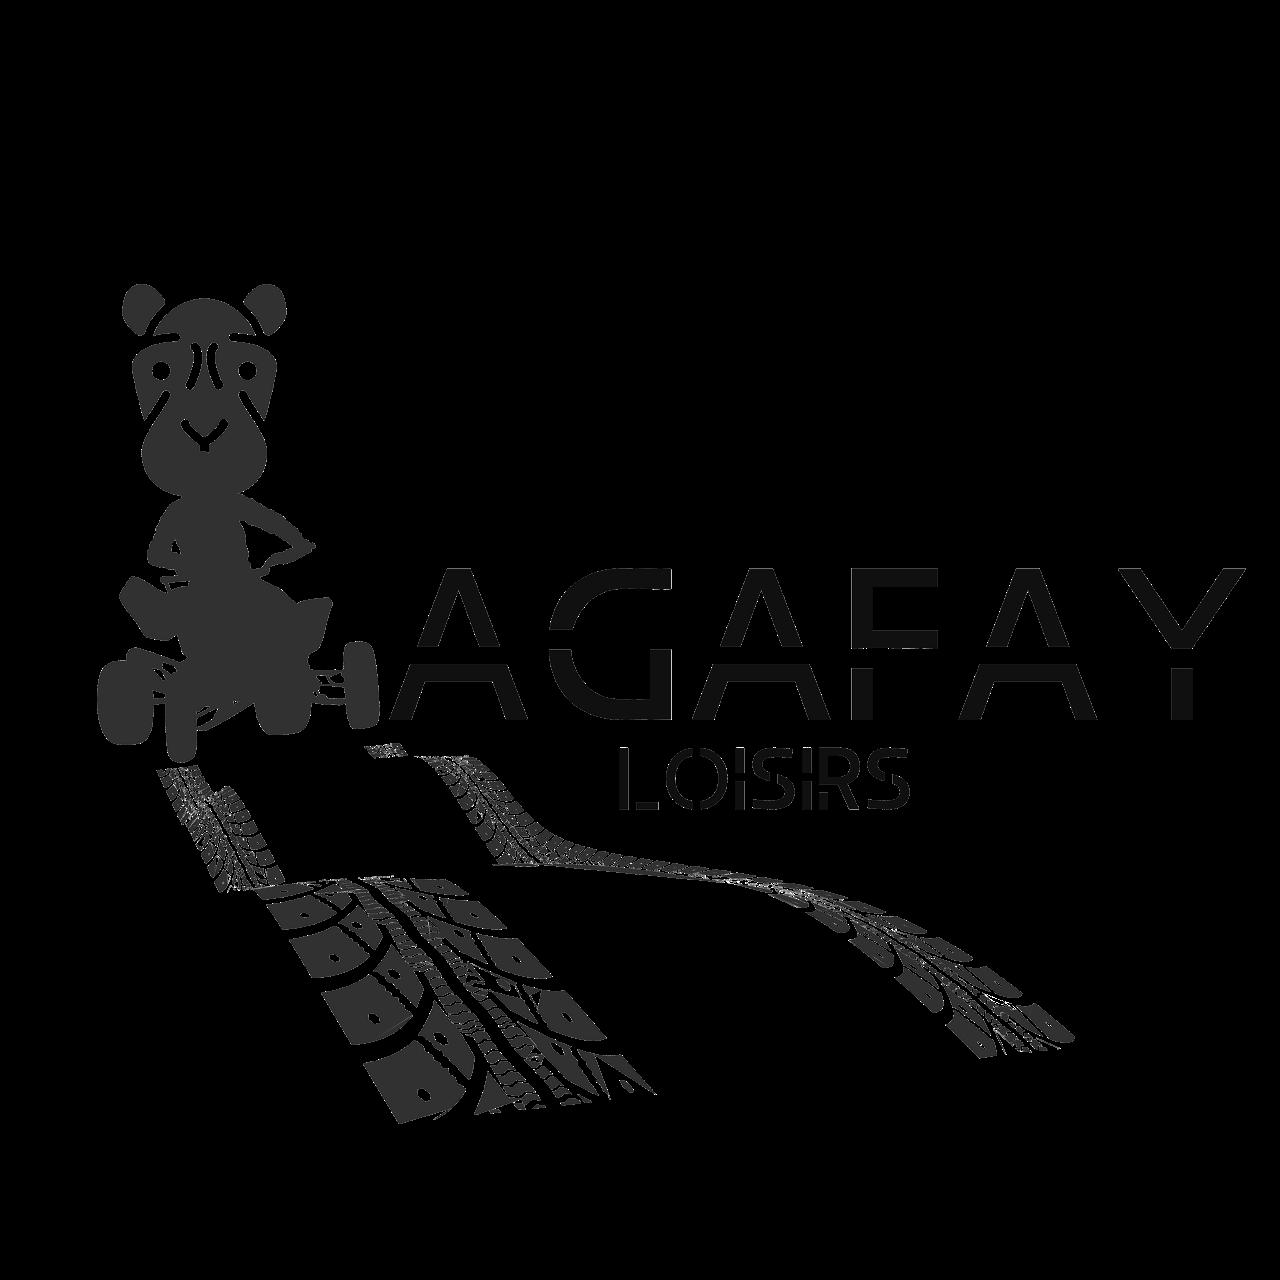 Agafay Quad loisirs